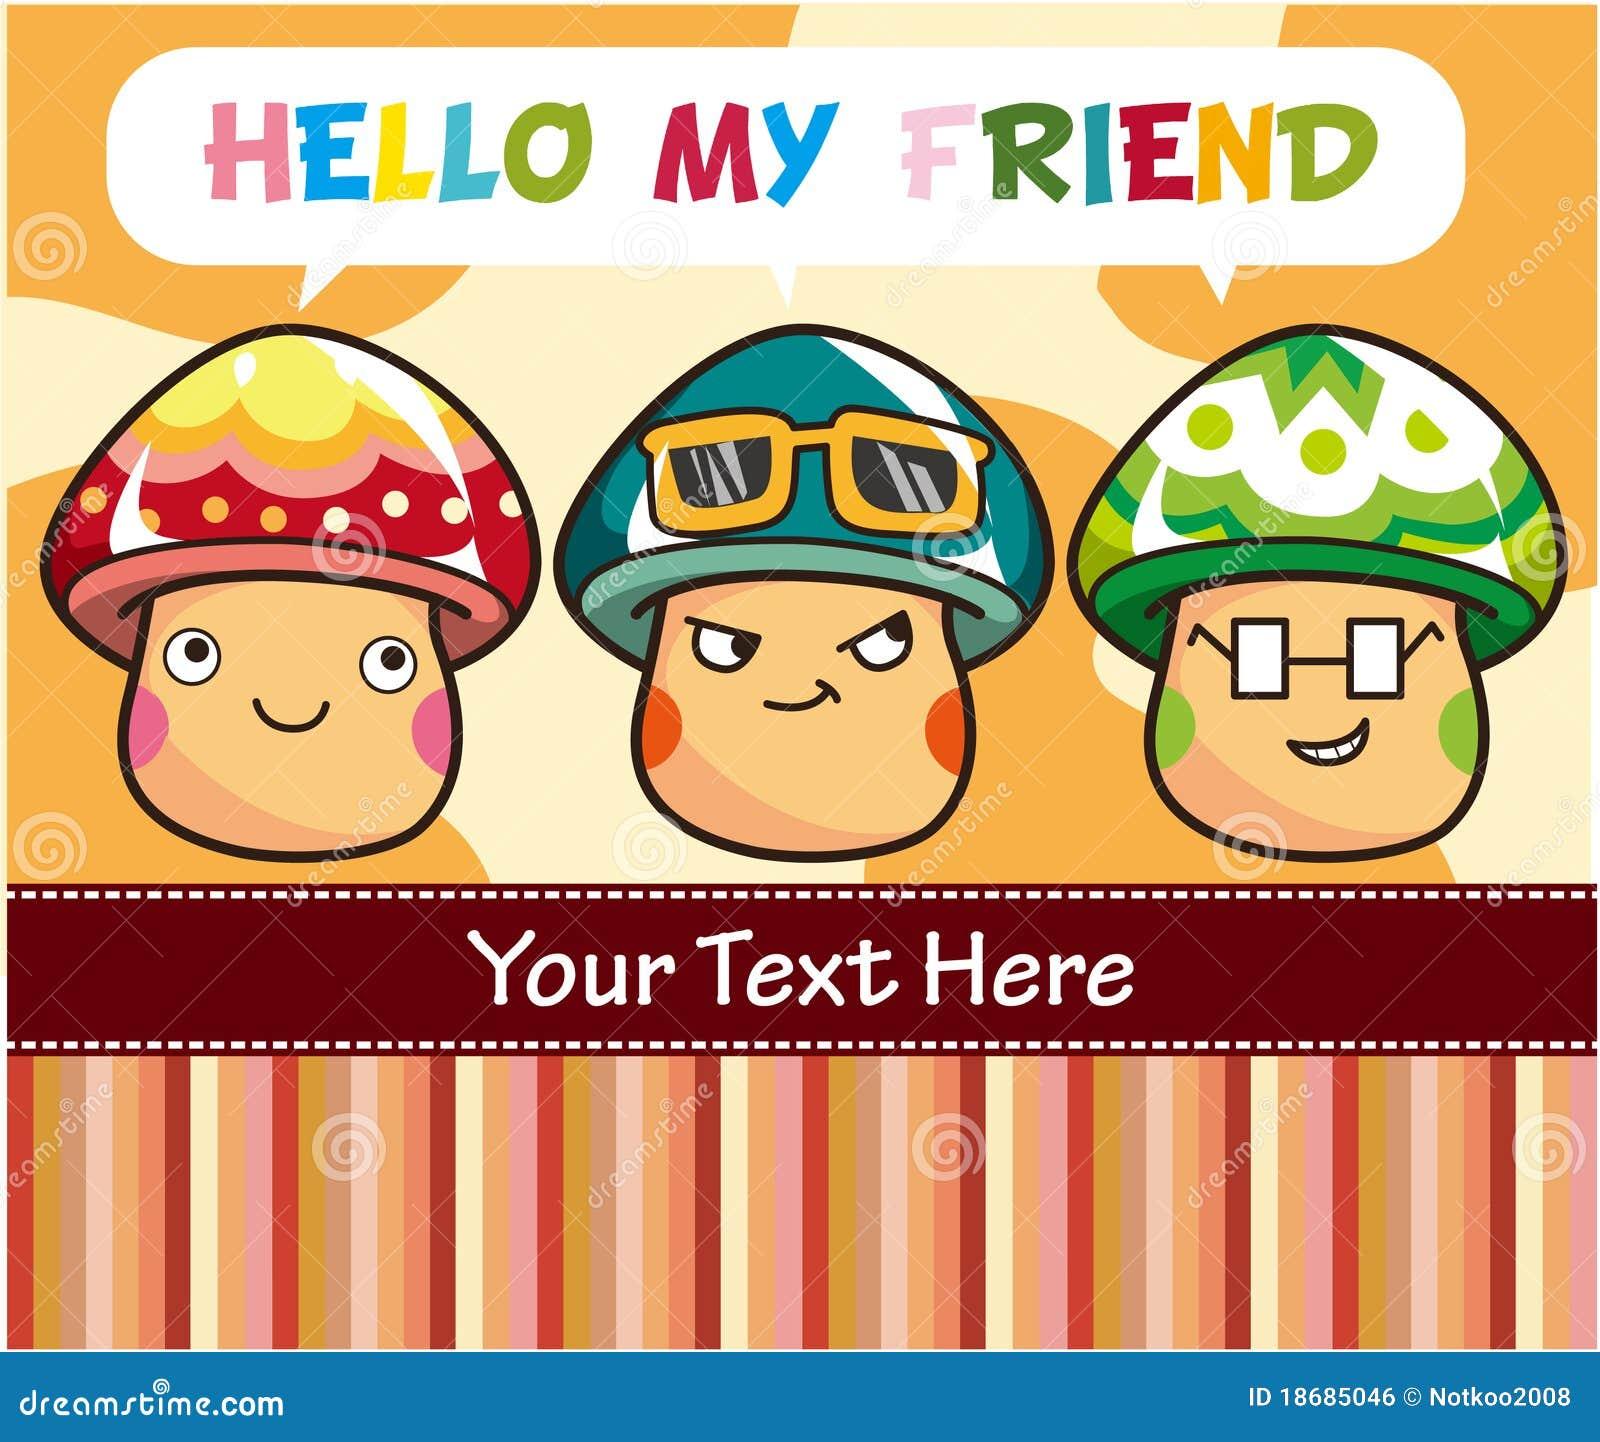 Cartoon Mushroom Card Royalty Free Stock Image - Image: 18685046